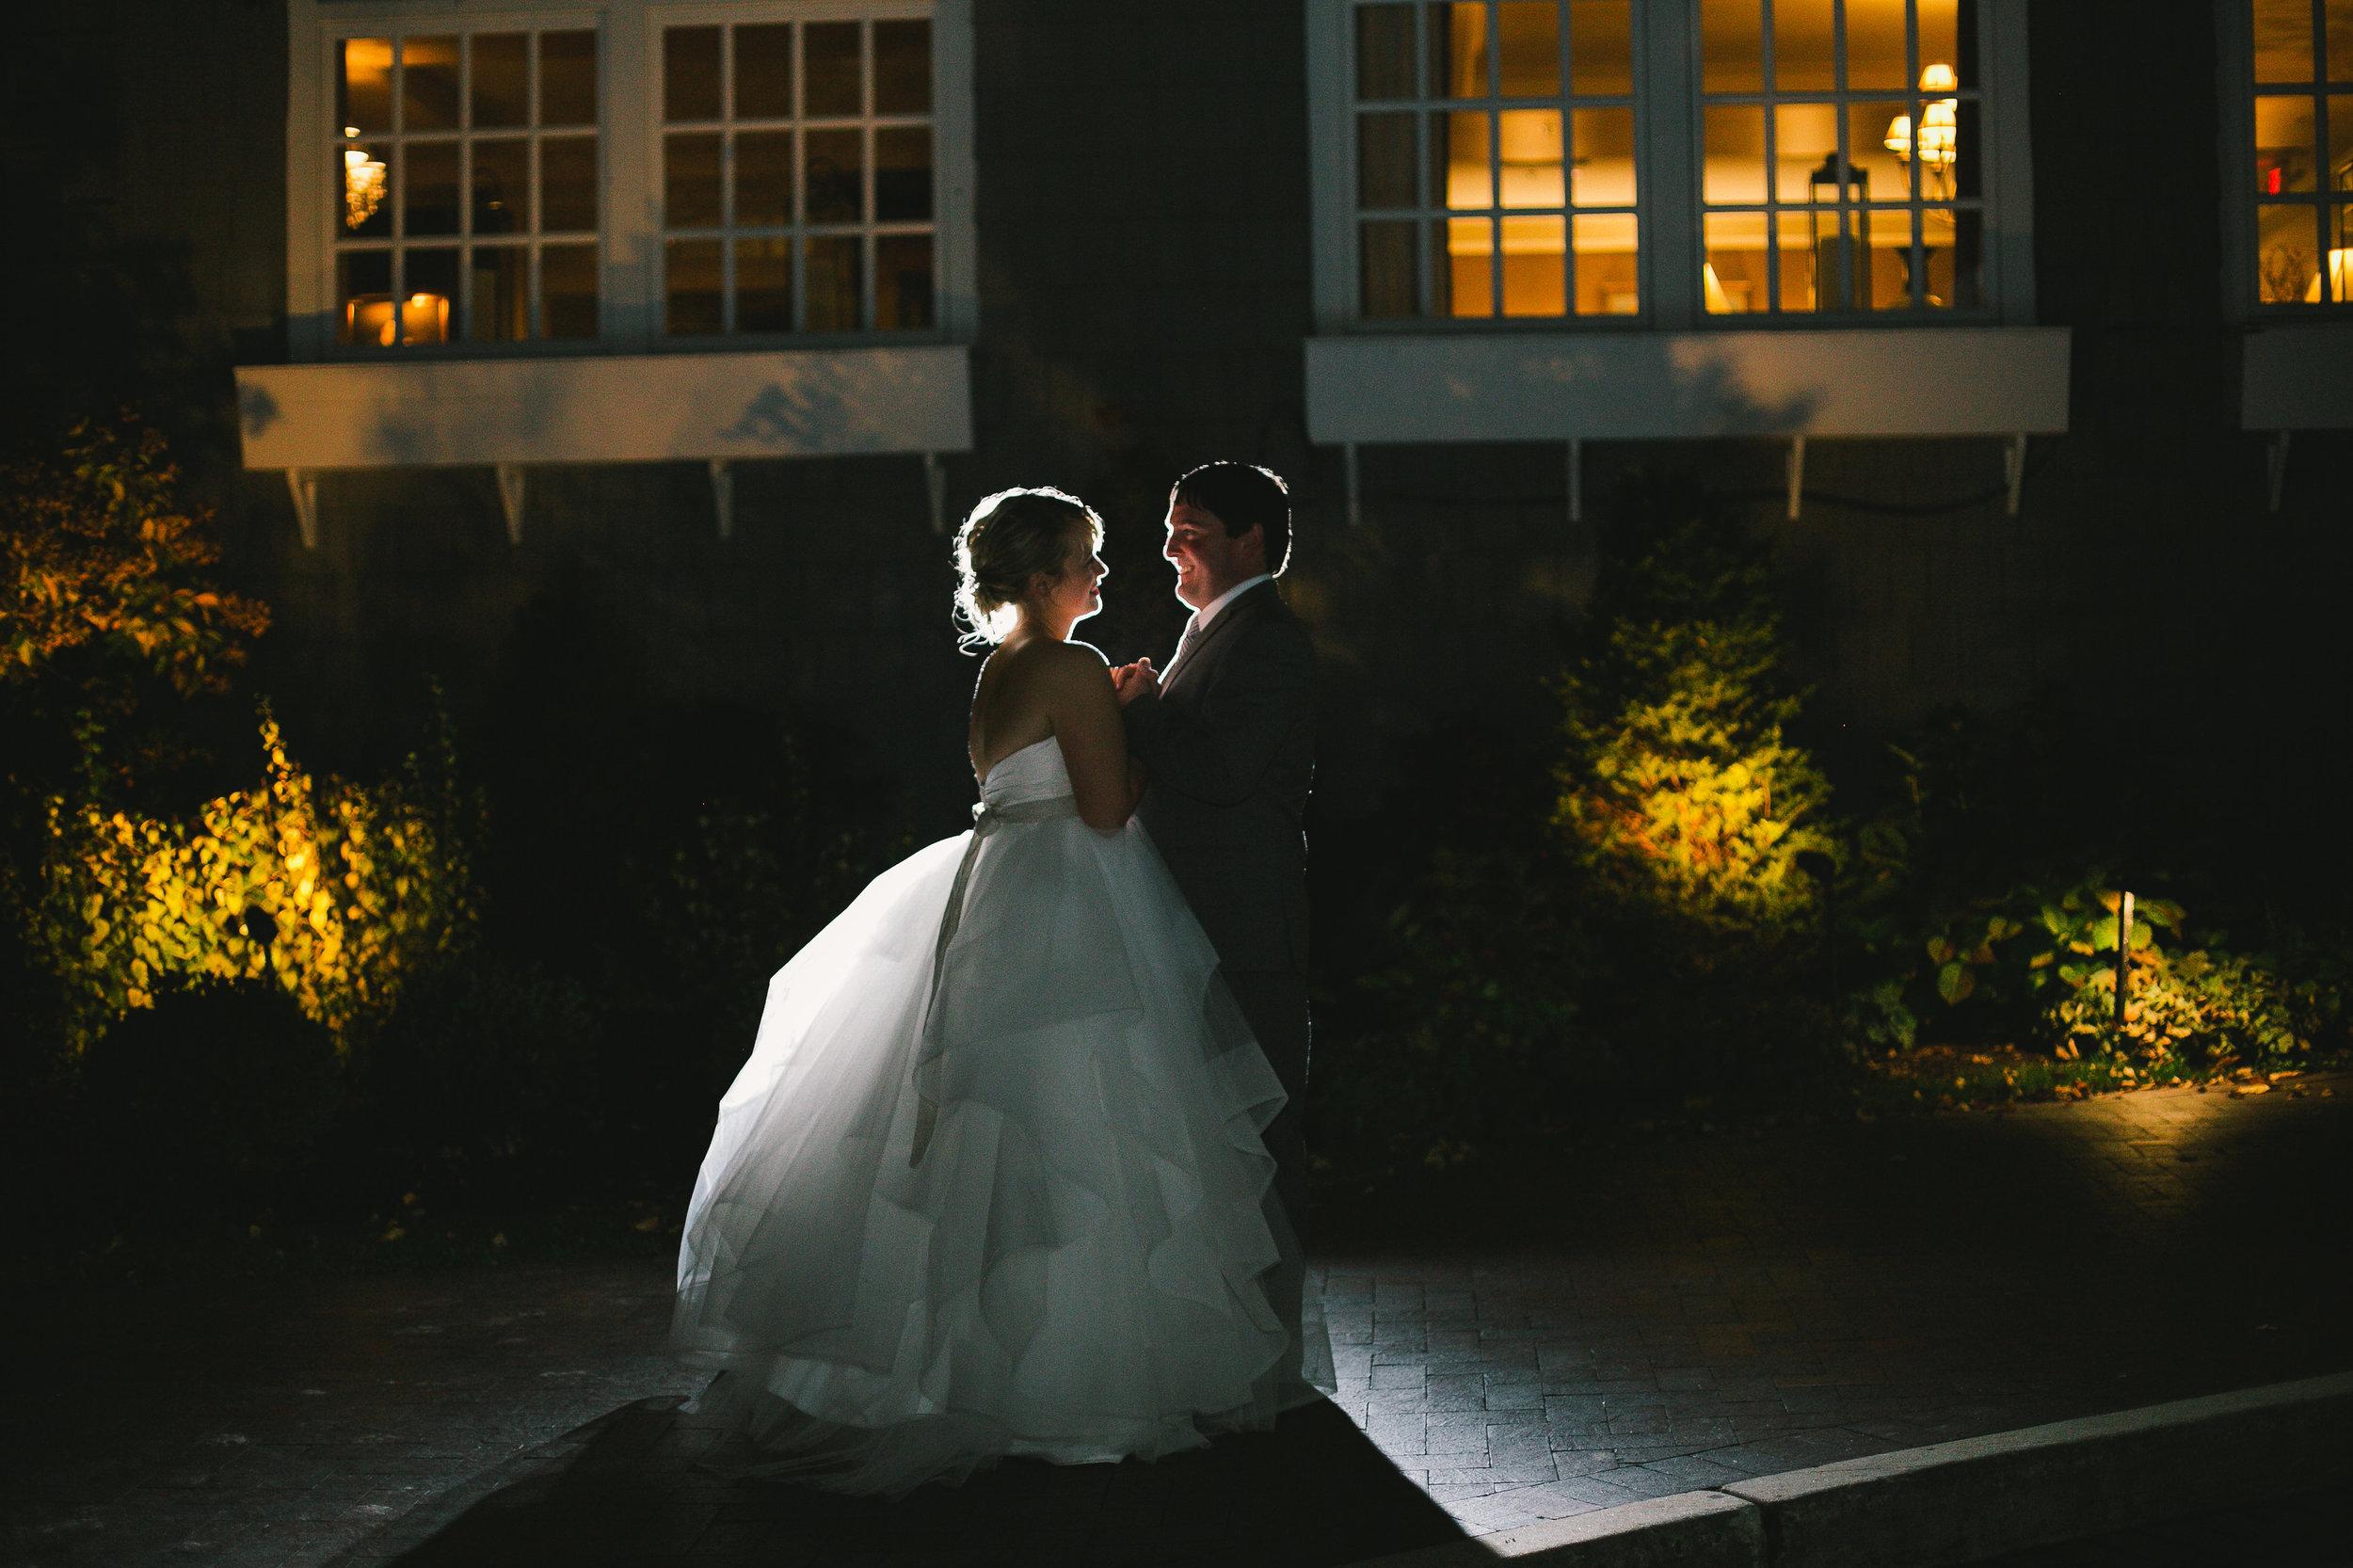 kim-nate-wedding-891 - Copy.jpg